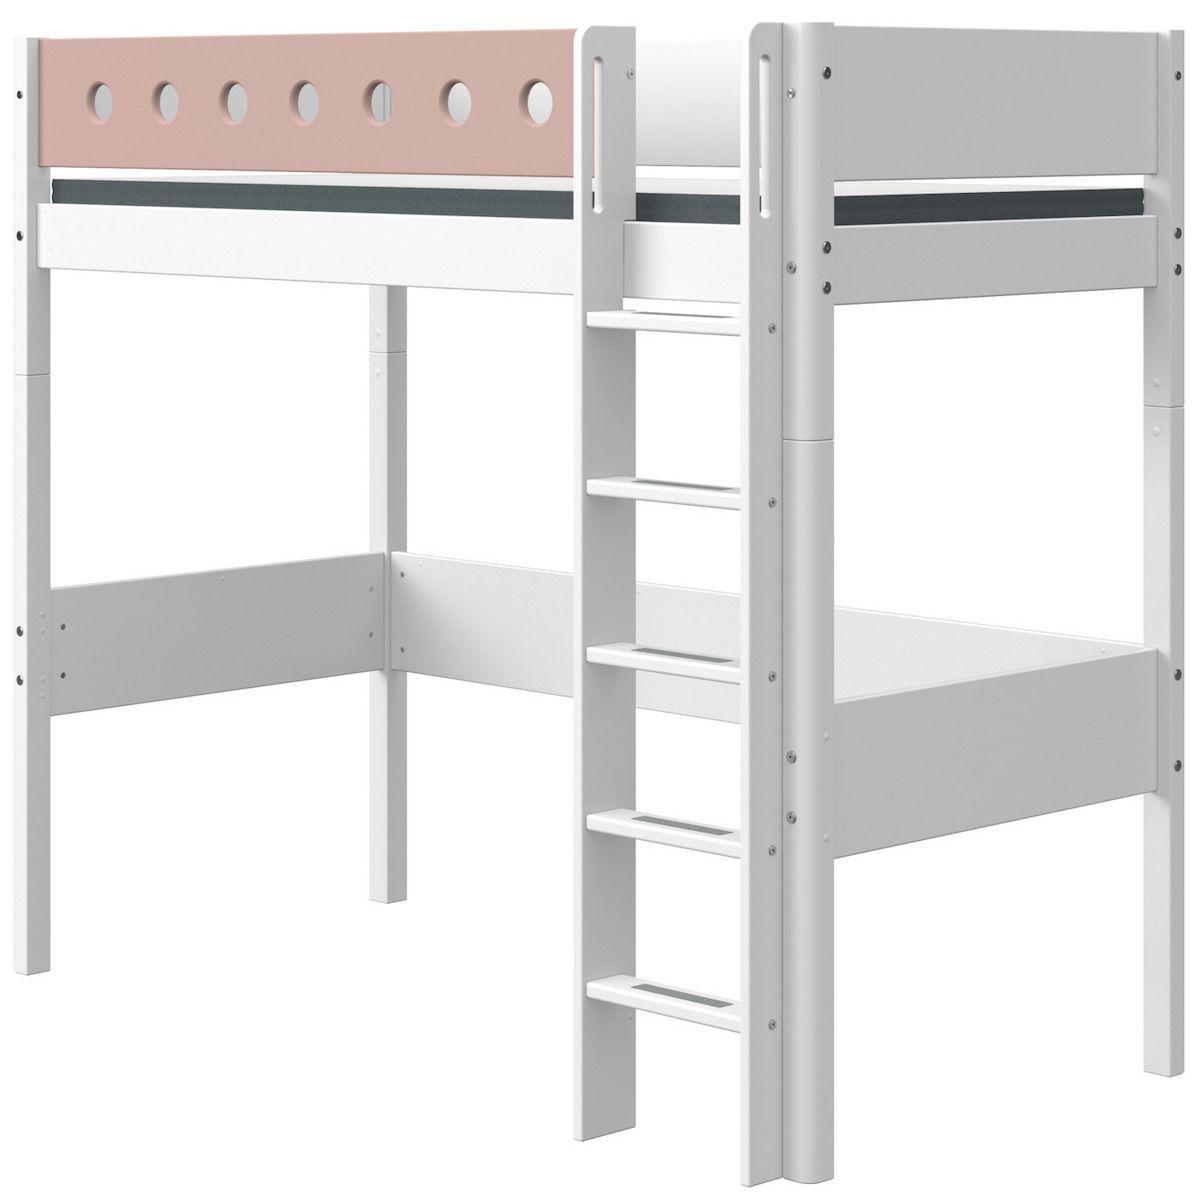 Cama alta 90x190cm escalera recta WHITE Flexa blanco-rosa claro